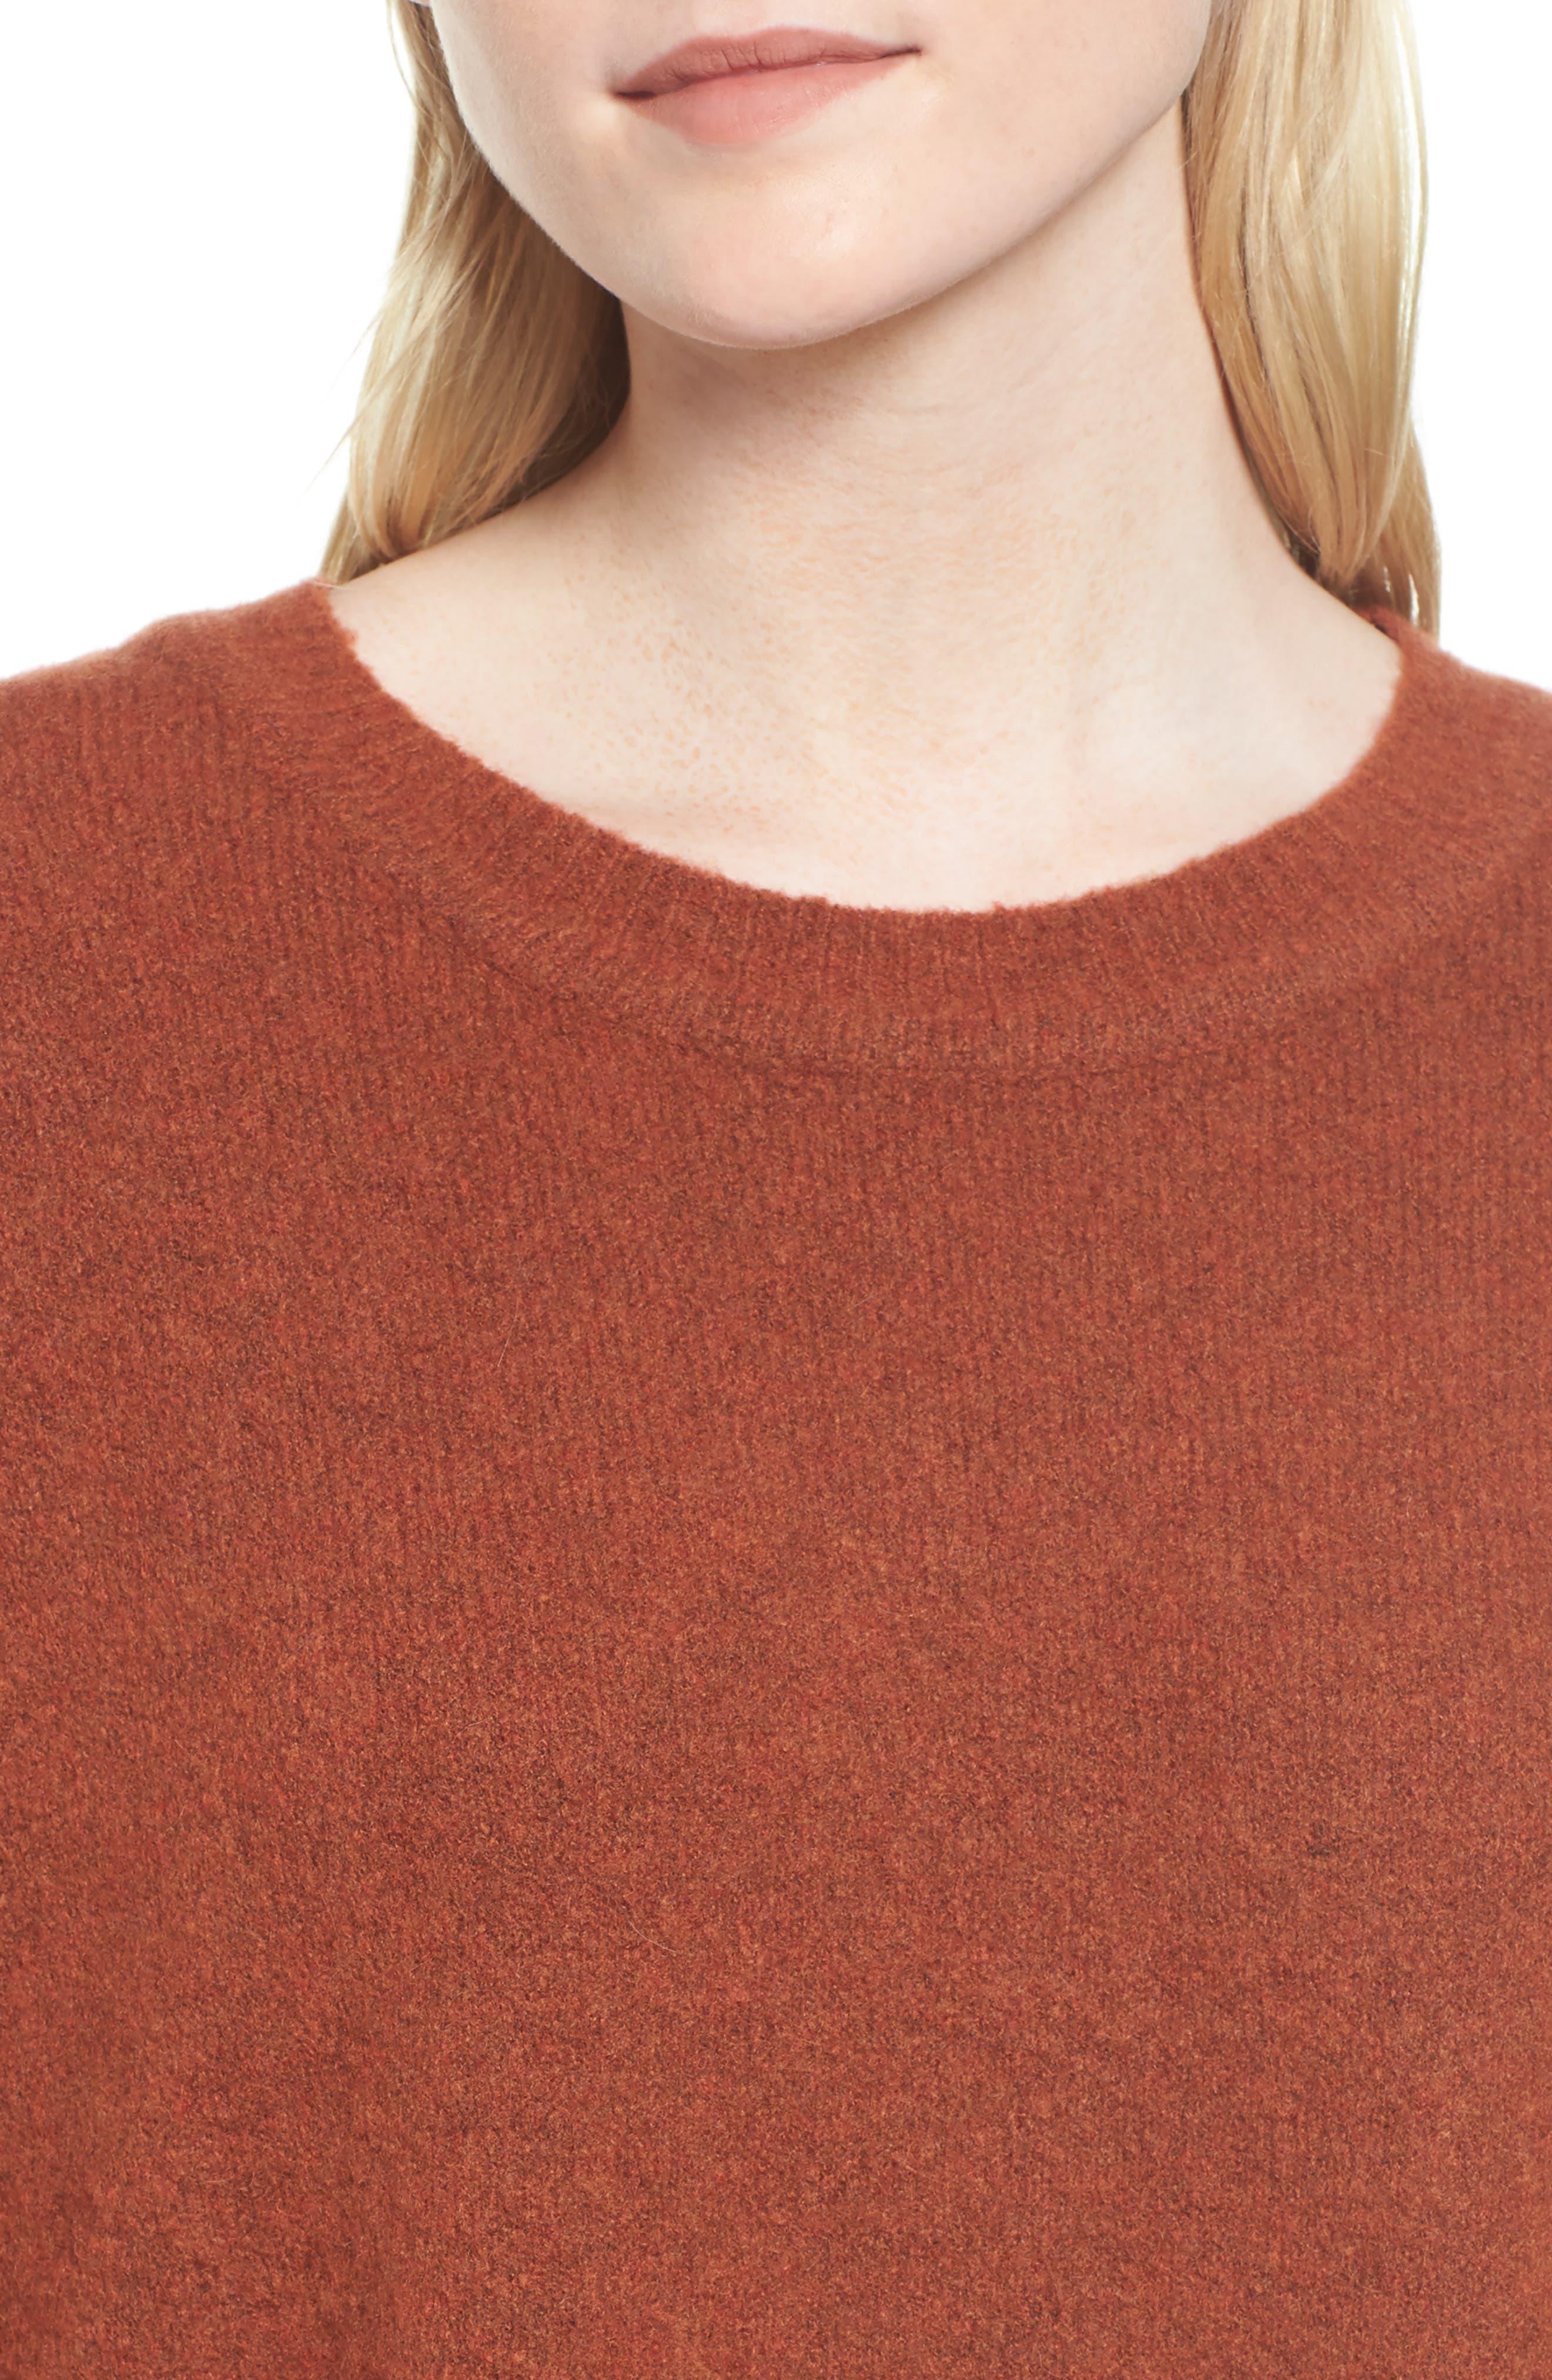 Oversize Cashmere Sweater,                             Alternate thumbnail 4, color,                             806